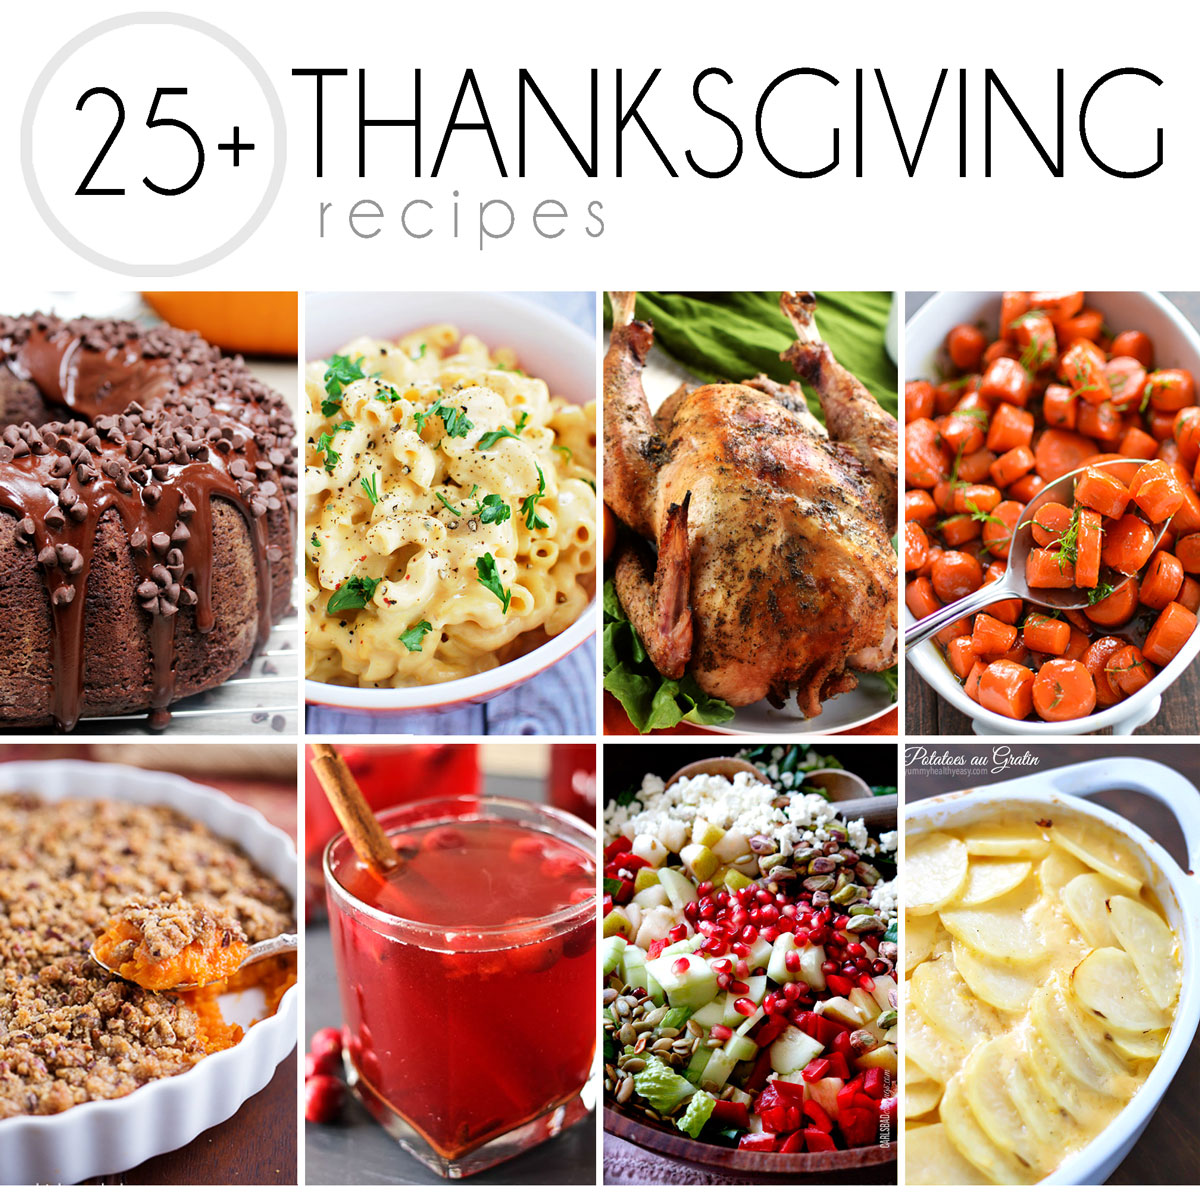 25+ Thanksgiving Recipes